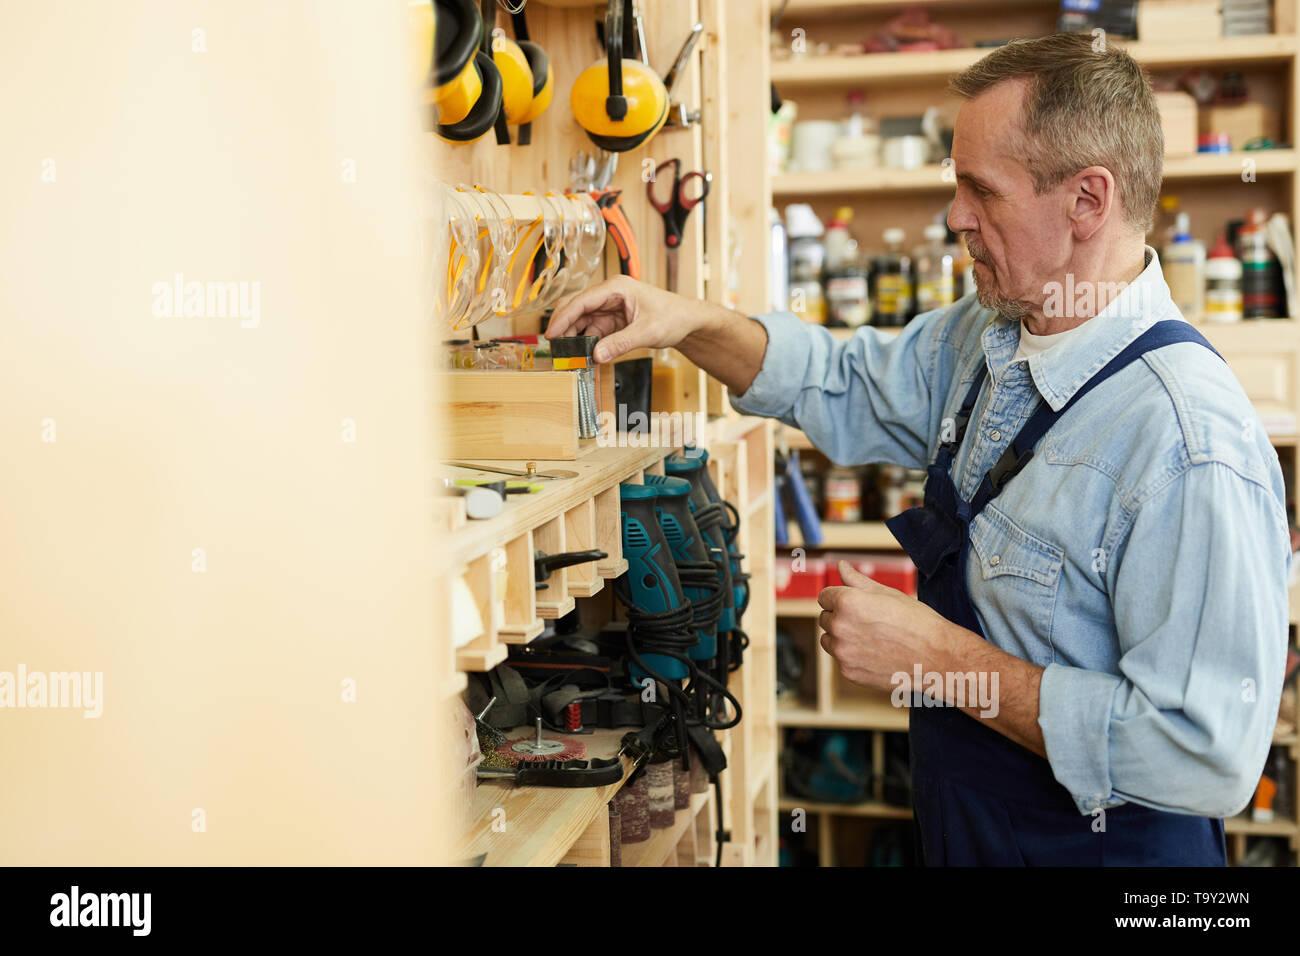 Side view portrait of senior carpenter choosing tools in workshop, copy space - Stock Image